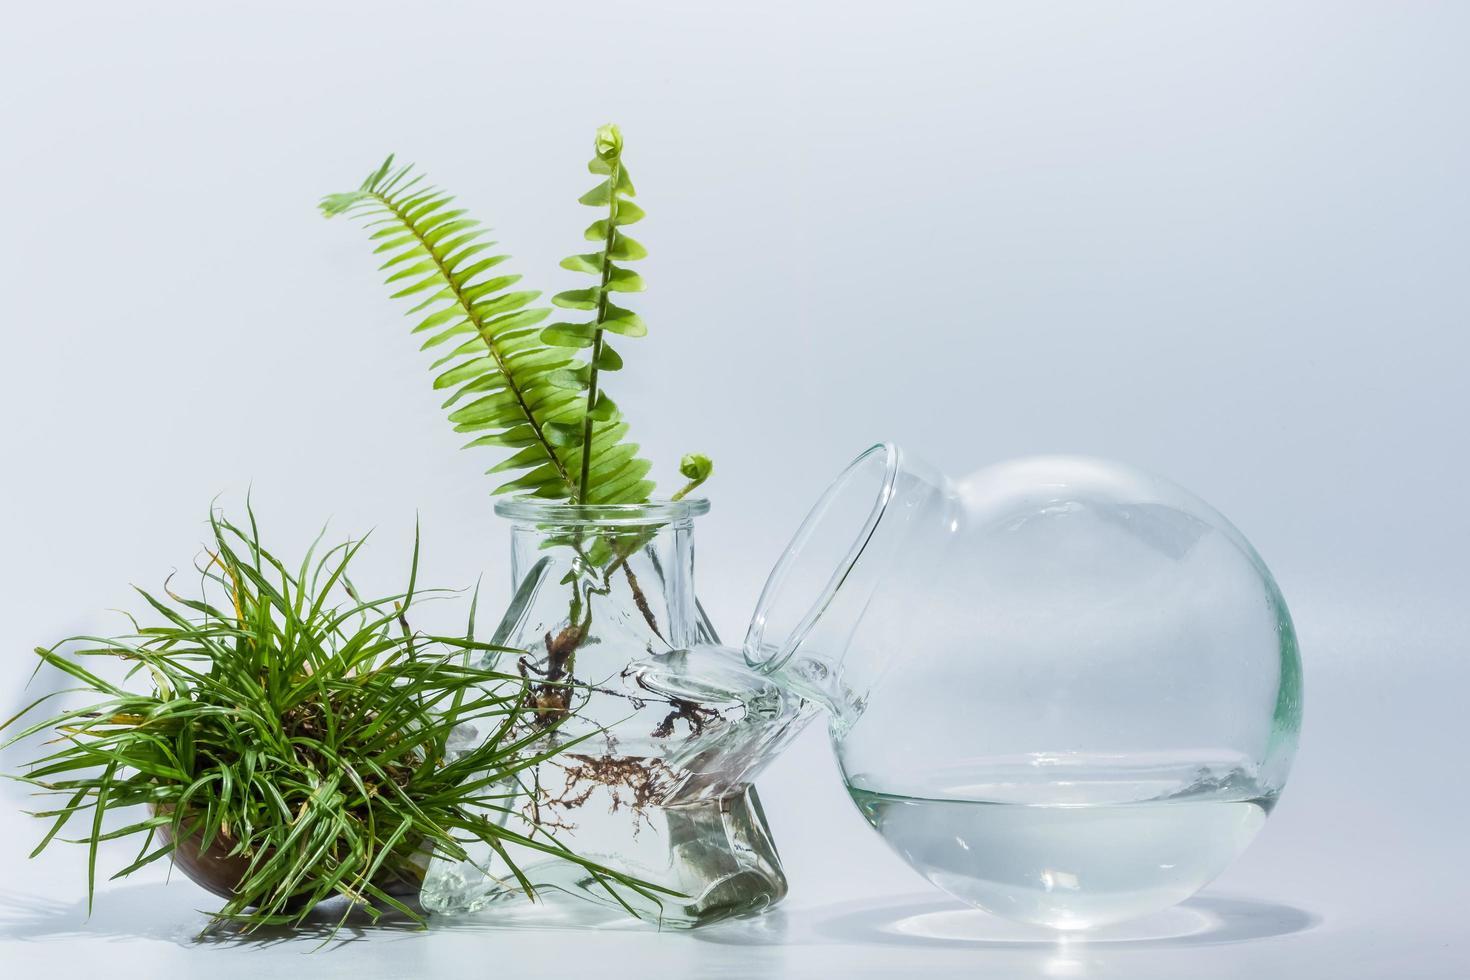 terrariumväxter på vit bakgrund foto